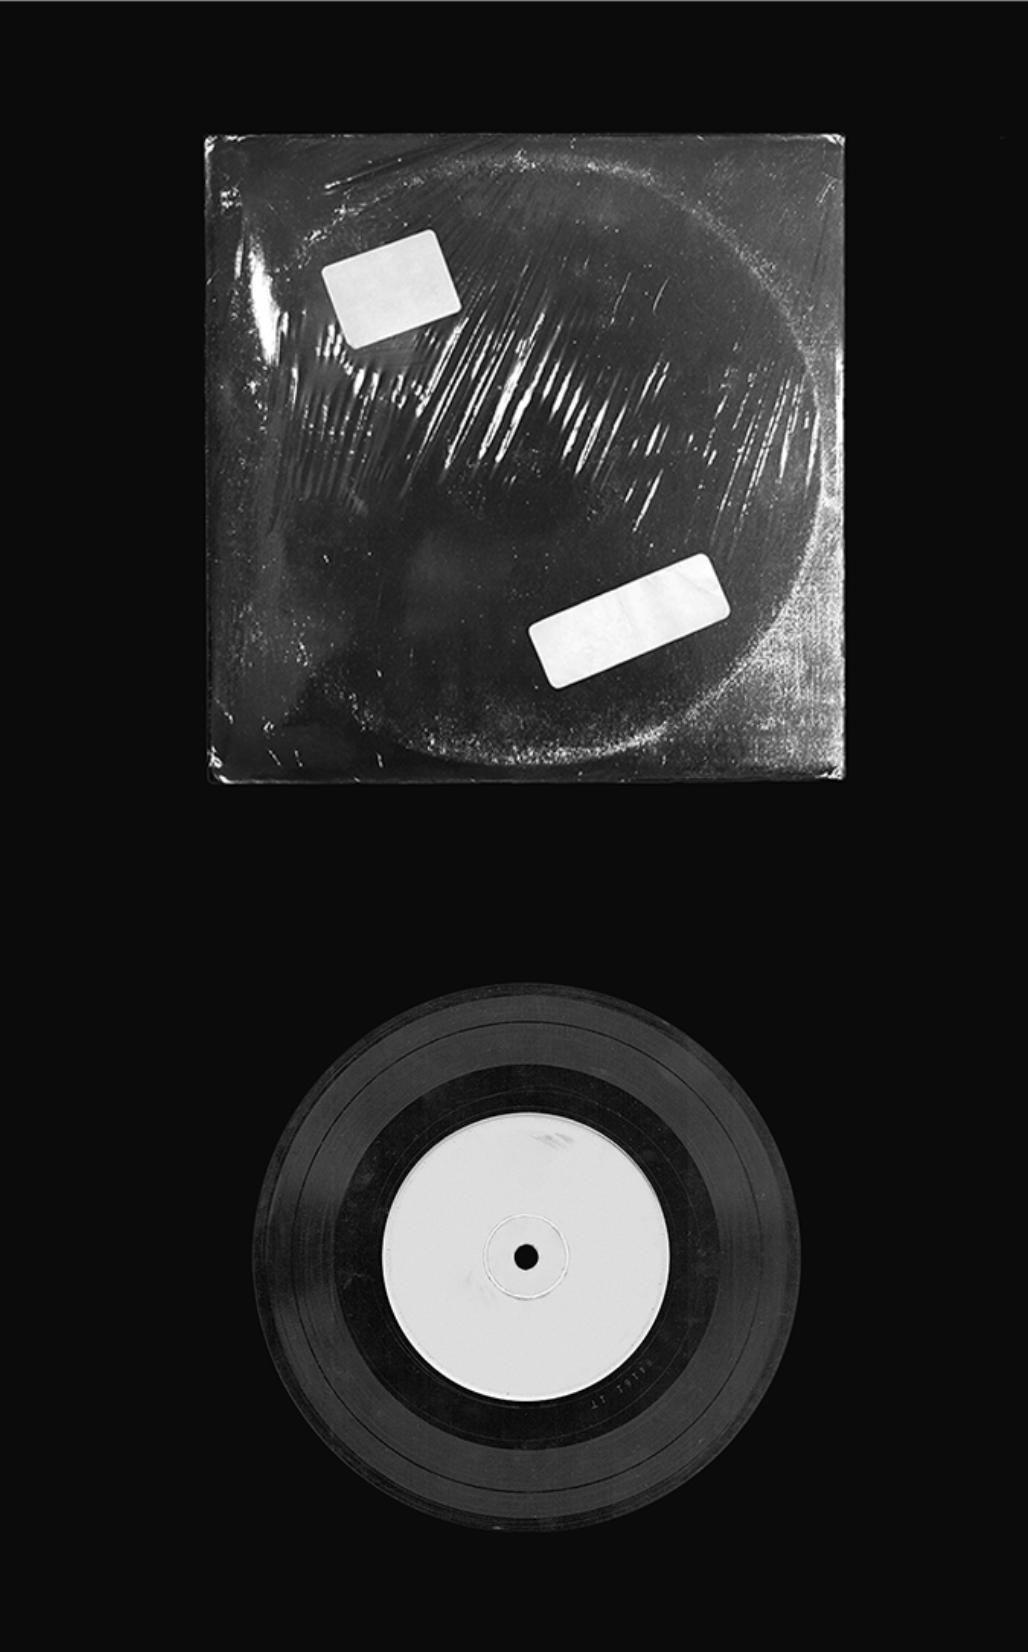 Phonograph Record Roadburn Festival Lp Record Album Png Free Download Records Record Album Phonograph Record